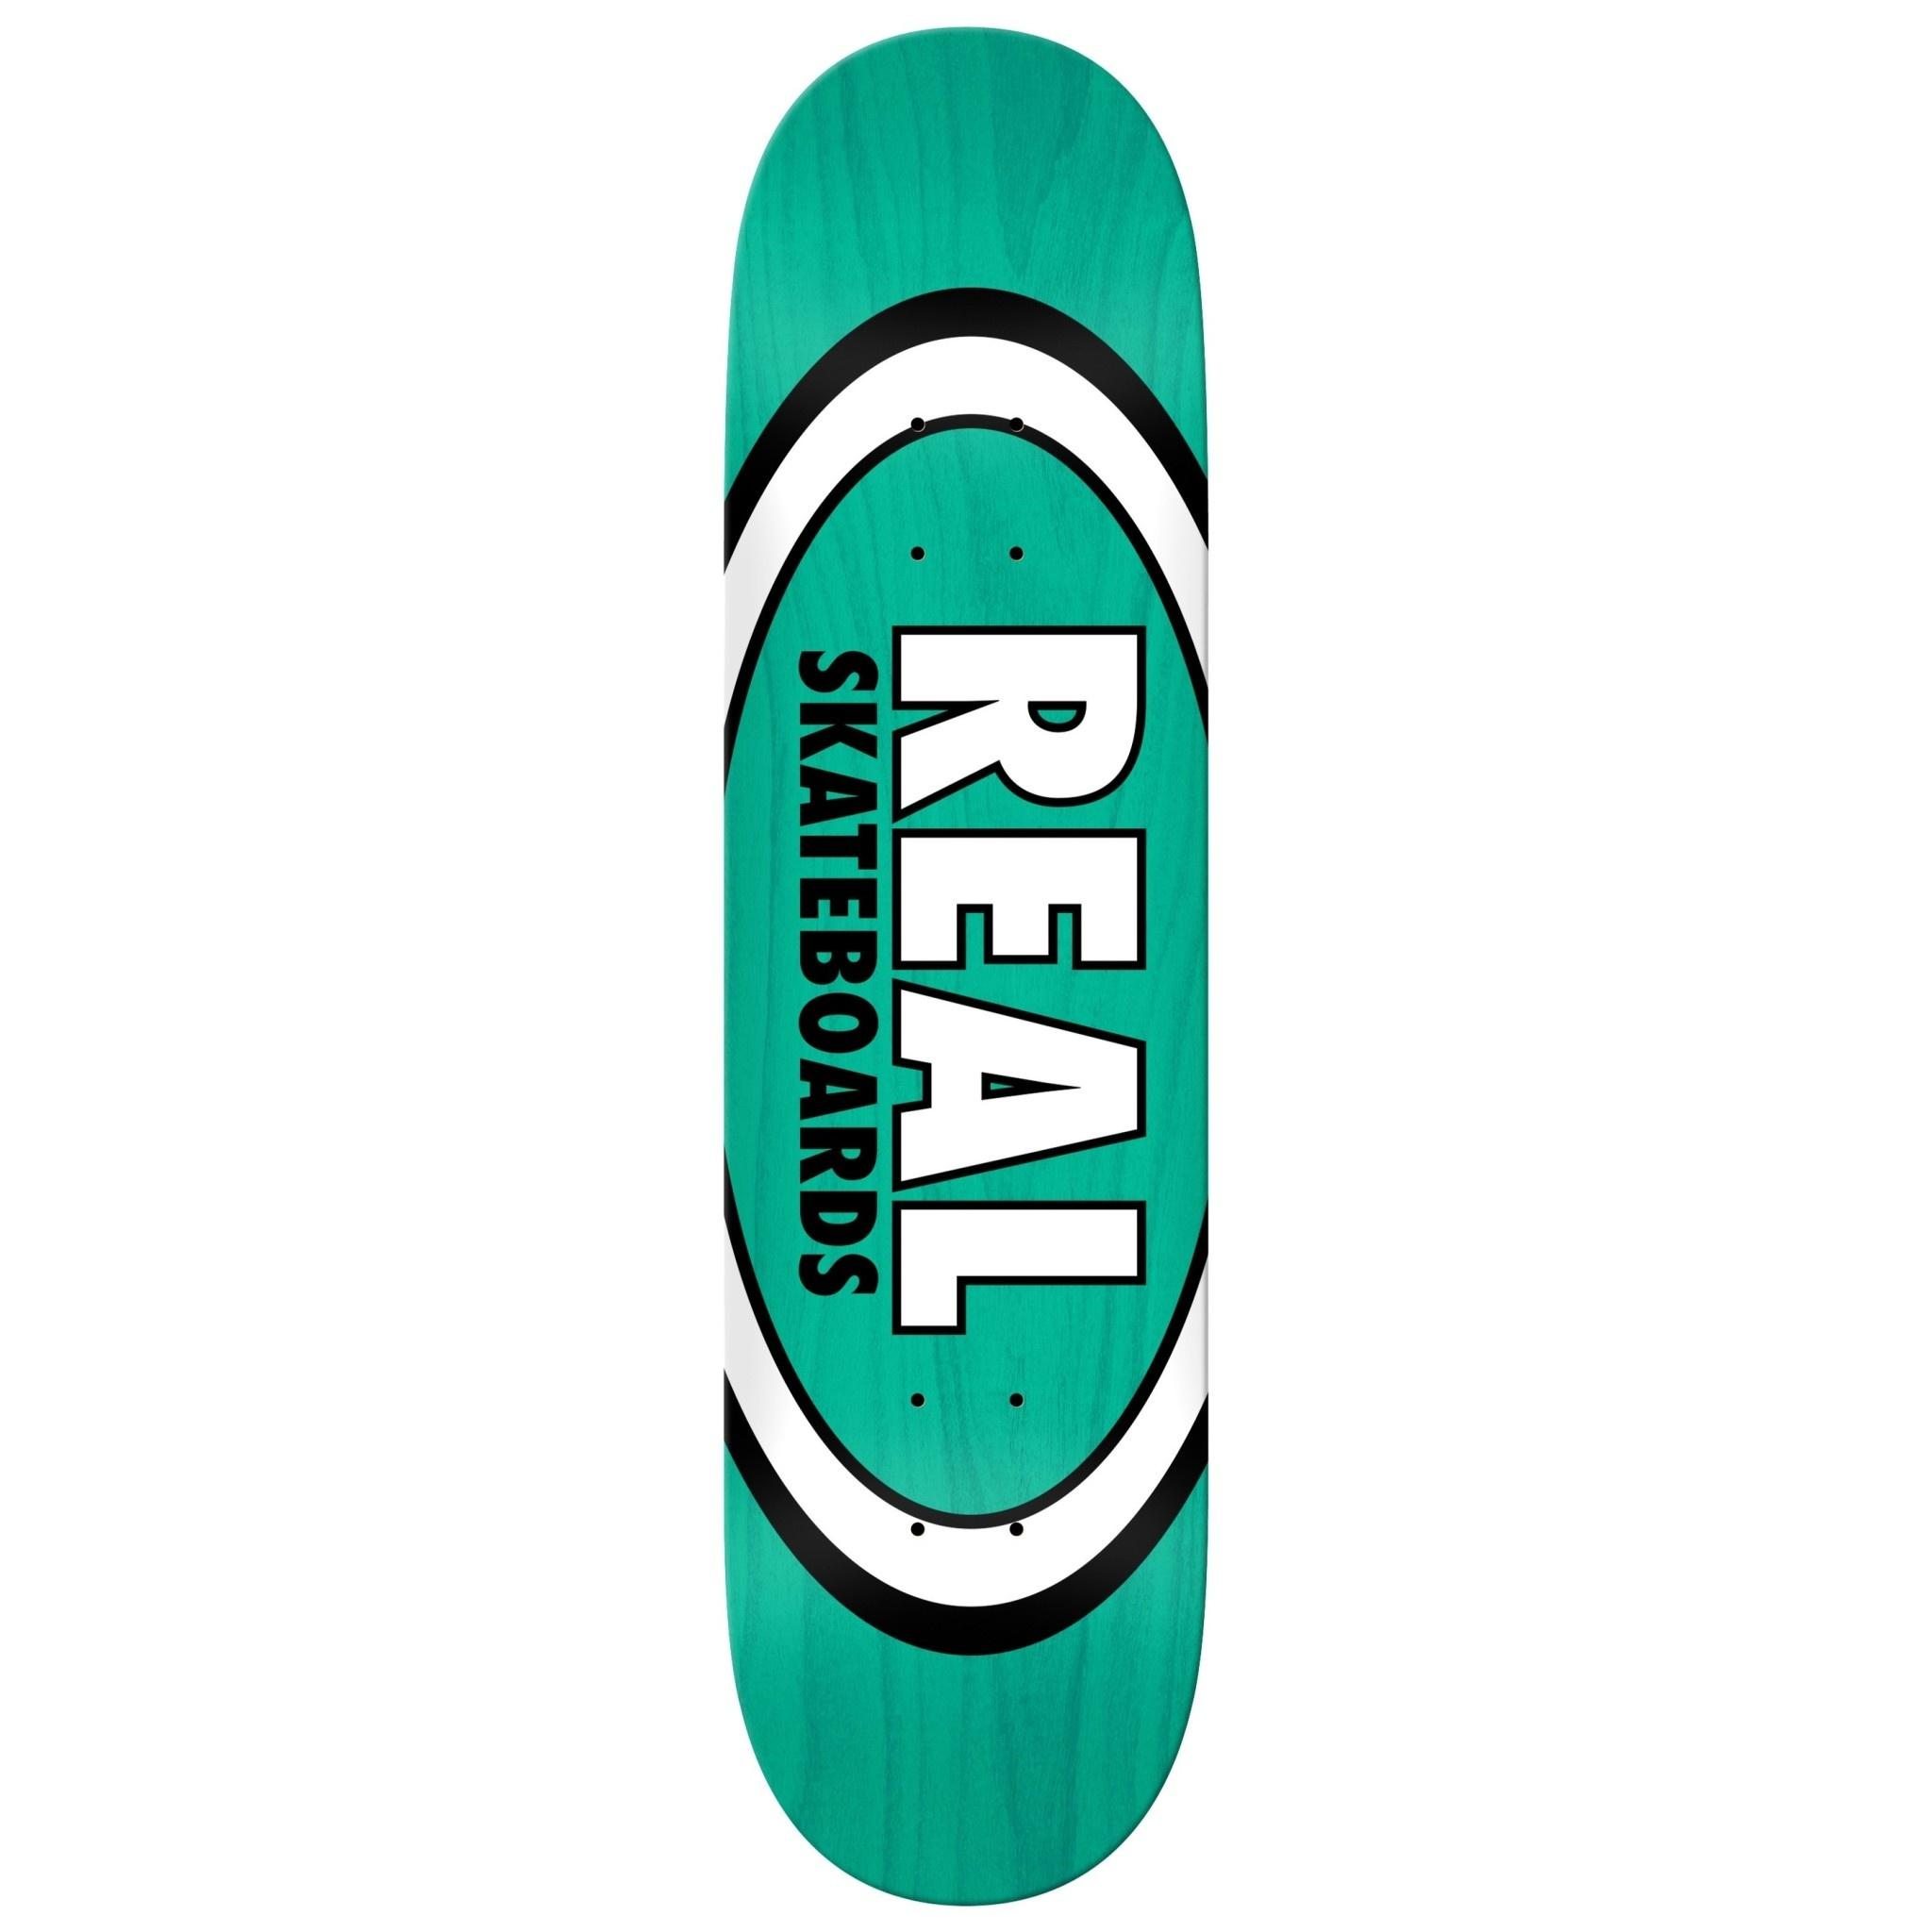 Real DECK-REAL OVERSPRAY OVAL (8.12)